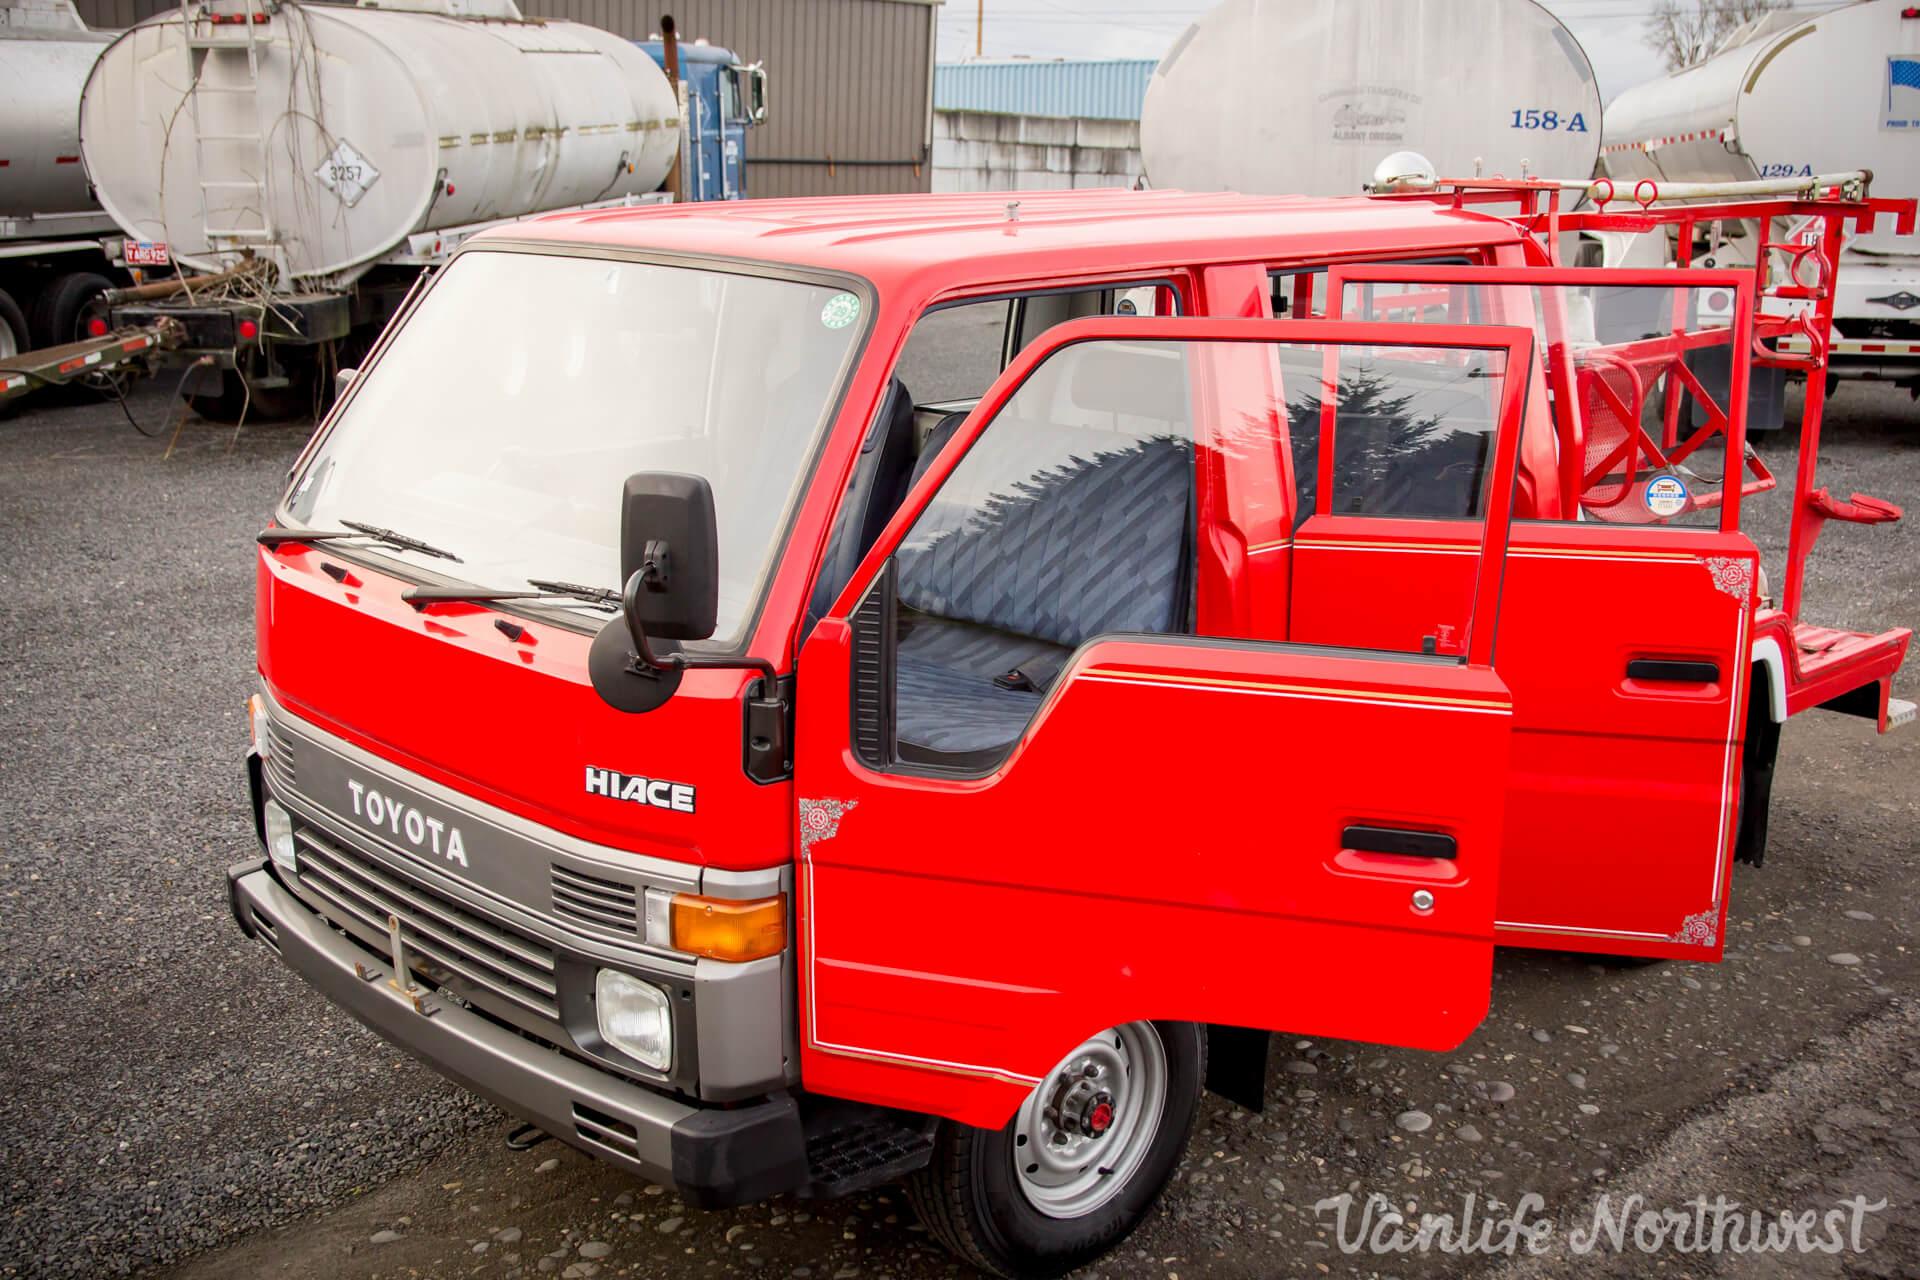 ToyotaHiaceFireTruckLH851990-30.jpg